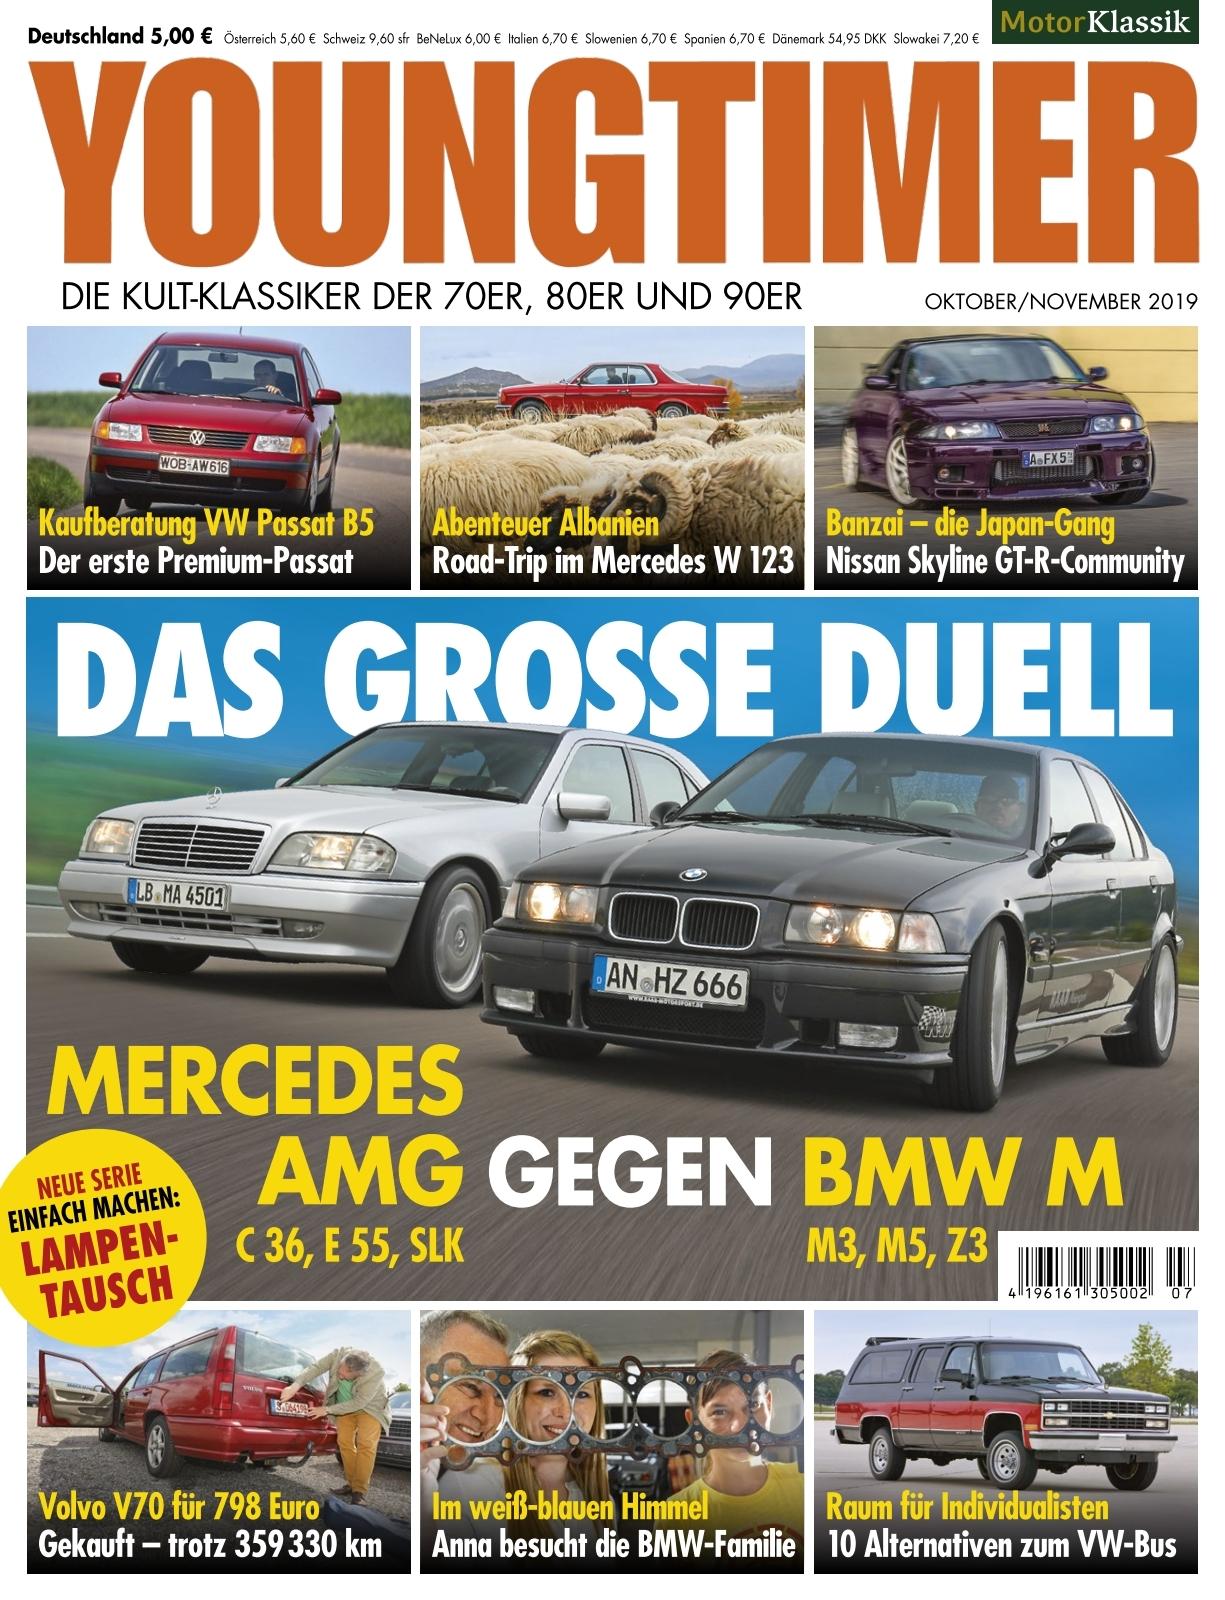 Öldeckel rot BMW R 1200 GS 03-12